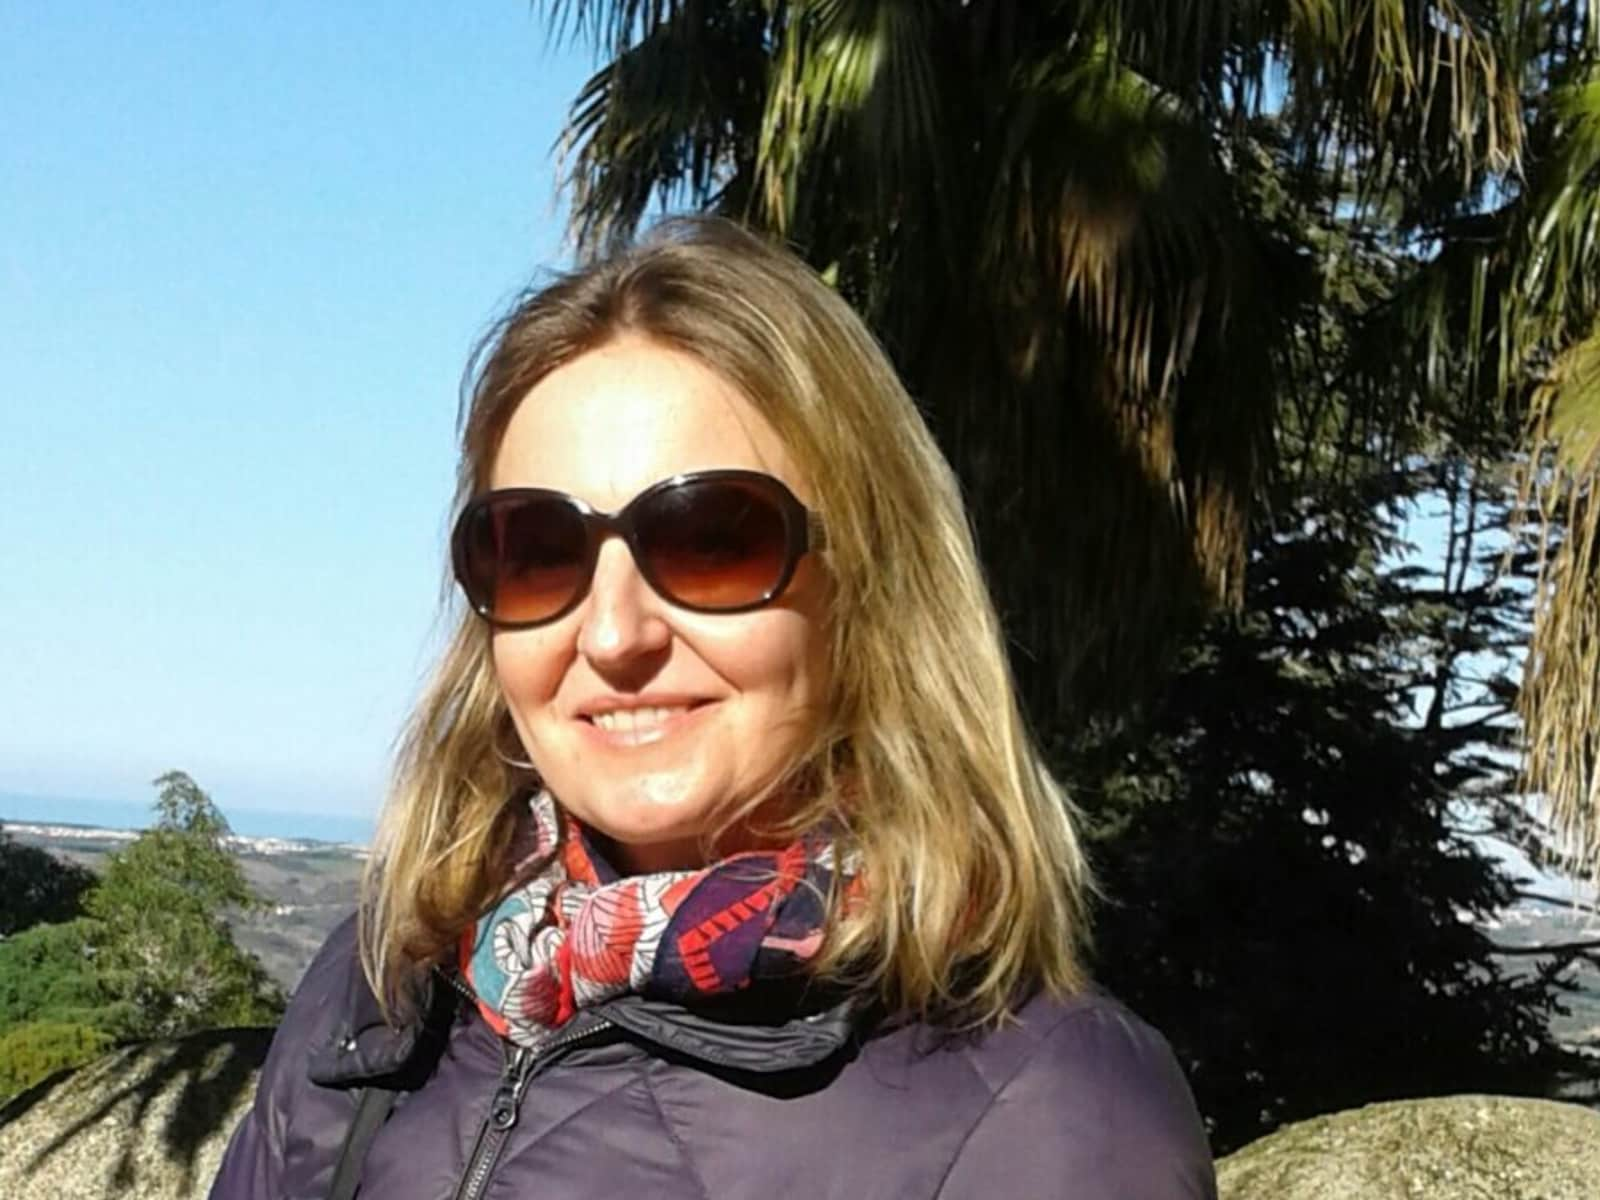 Anna from Bristol, United Kingdom